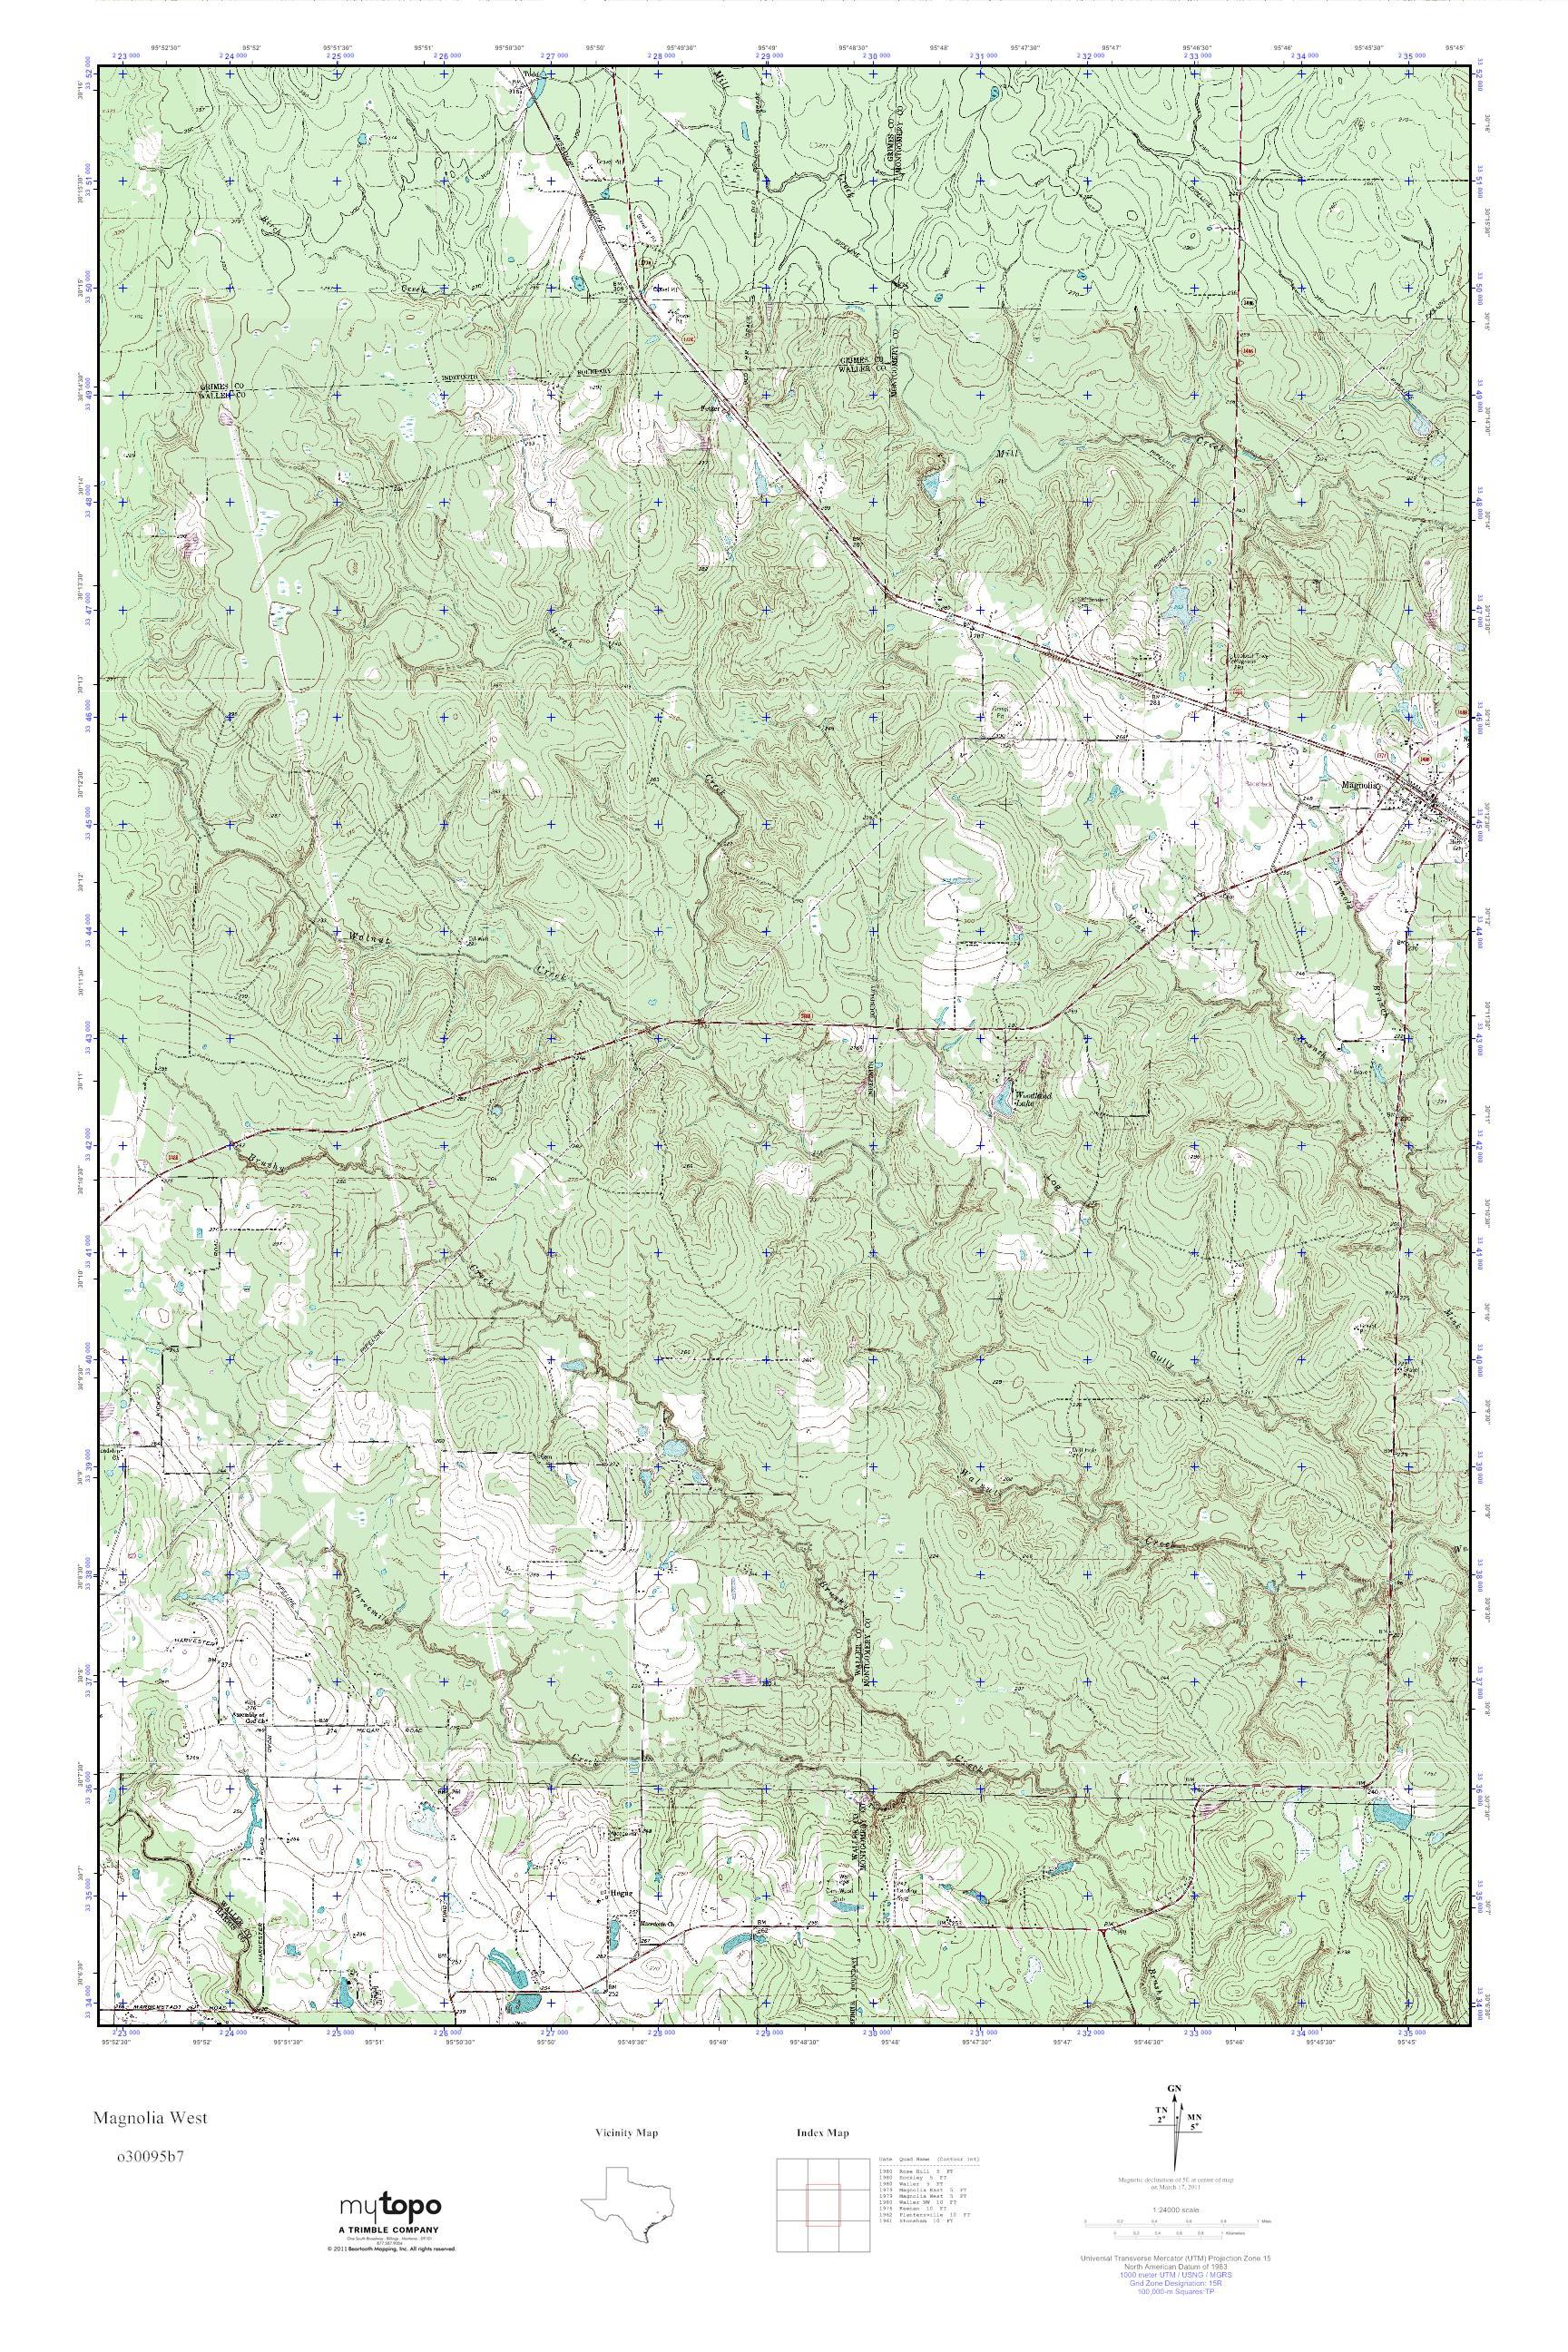 Mytopo Magnolia West, Texas Usgs Quad Topo Map - Magnolia Texas Map